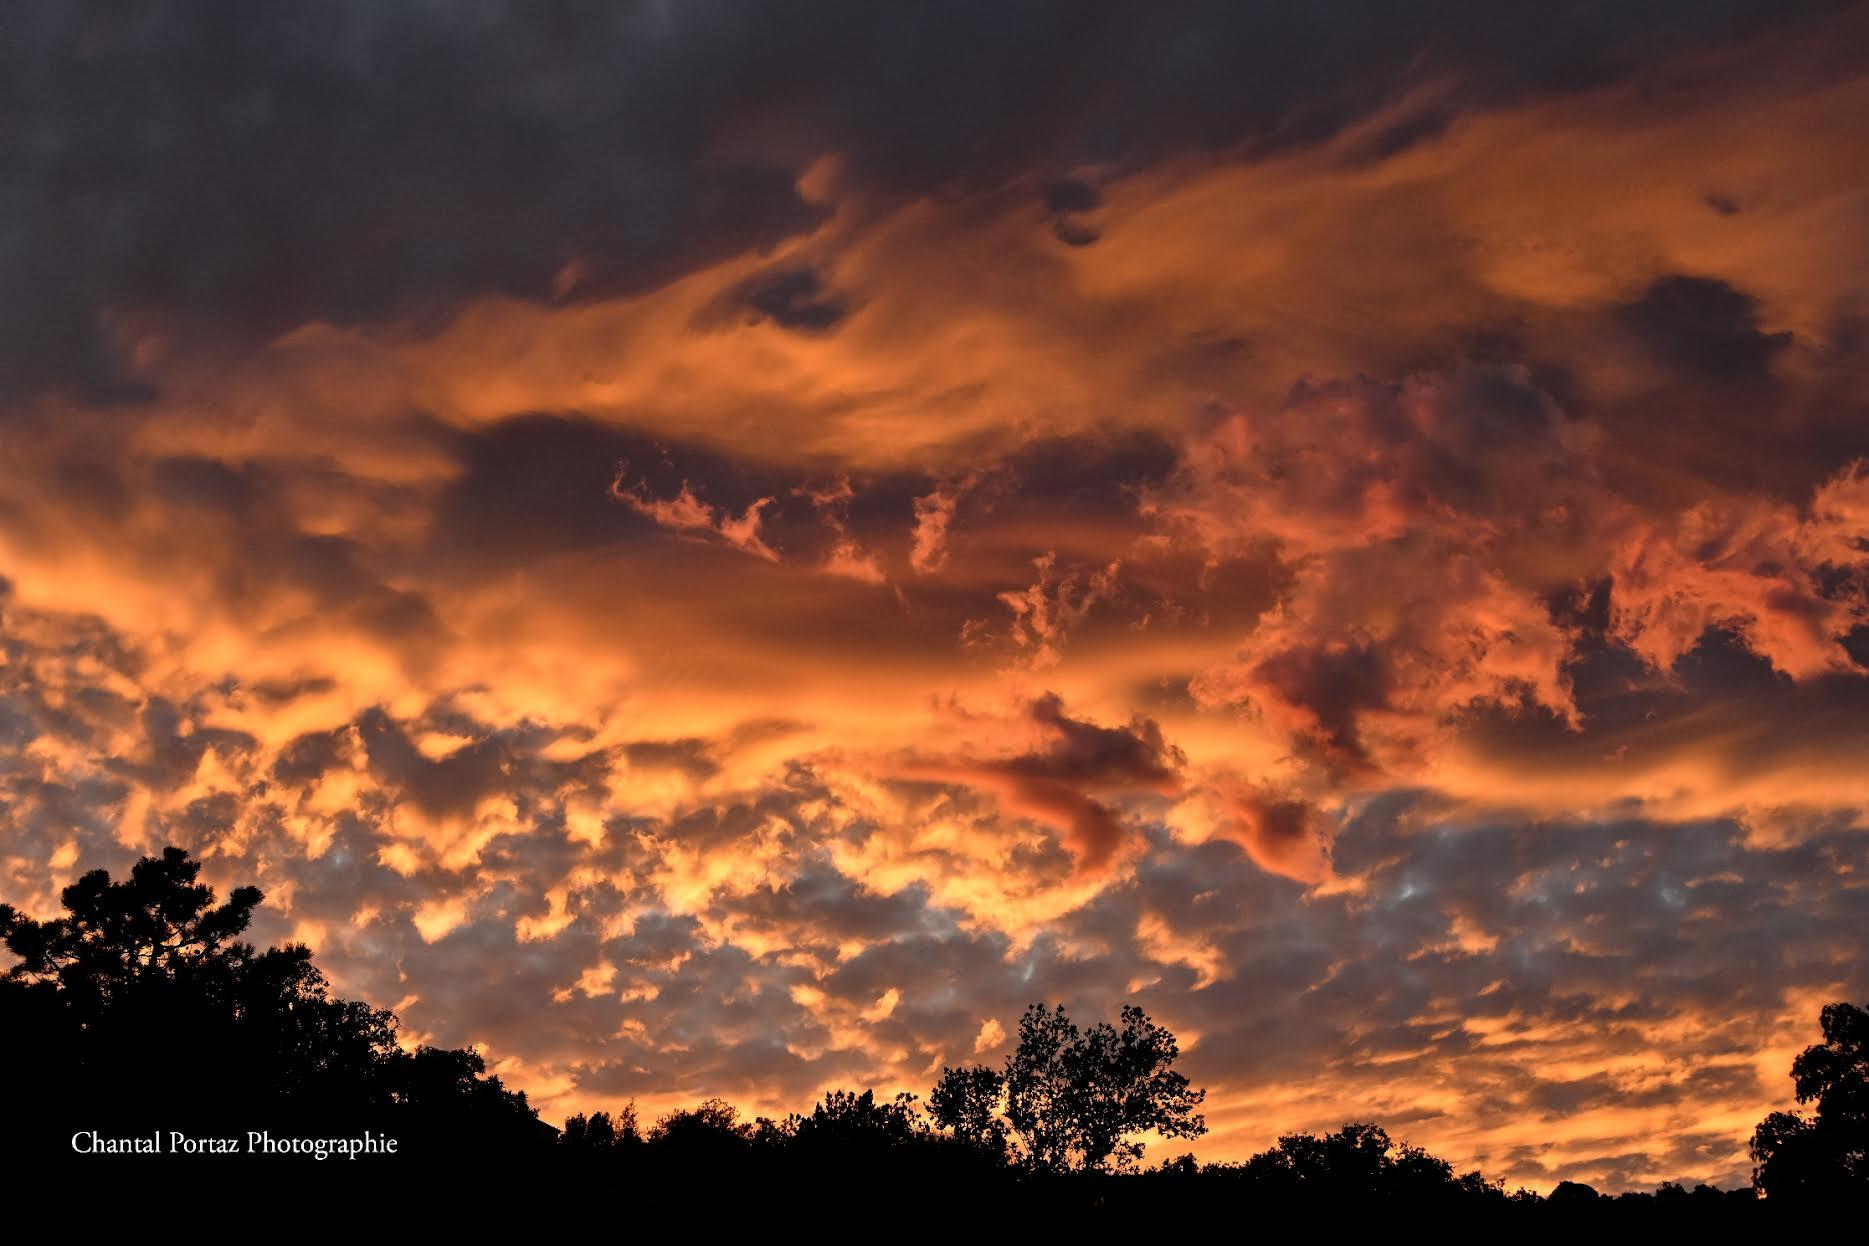 Le ciel de Porto-Vecchio (Chantal Portaz Biancarelli )